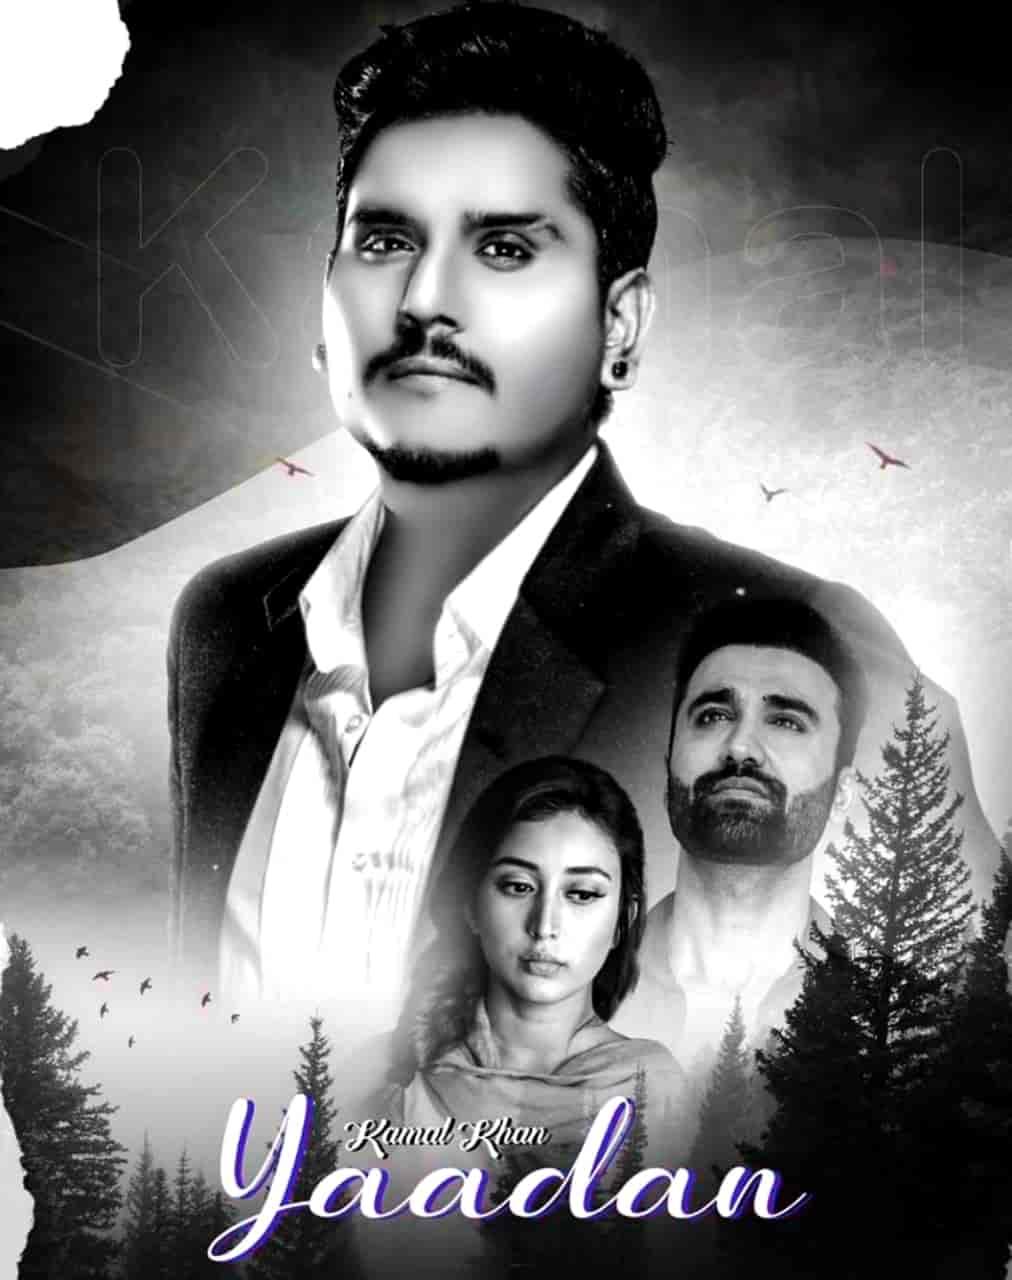 Yaadan Sad Punjabi Song Image Sung By Kamal Khan